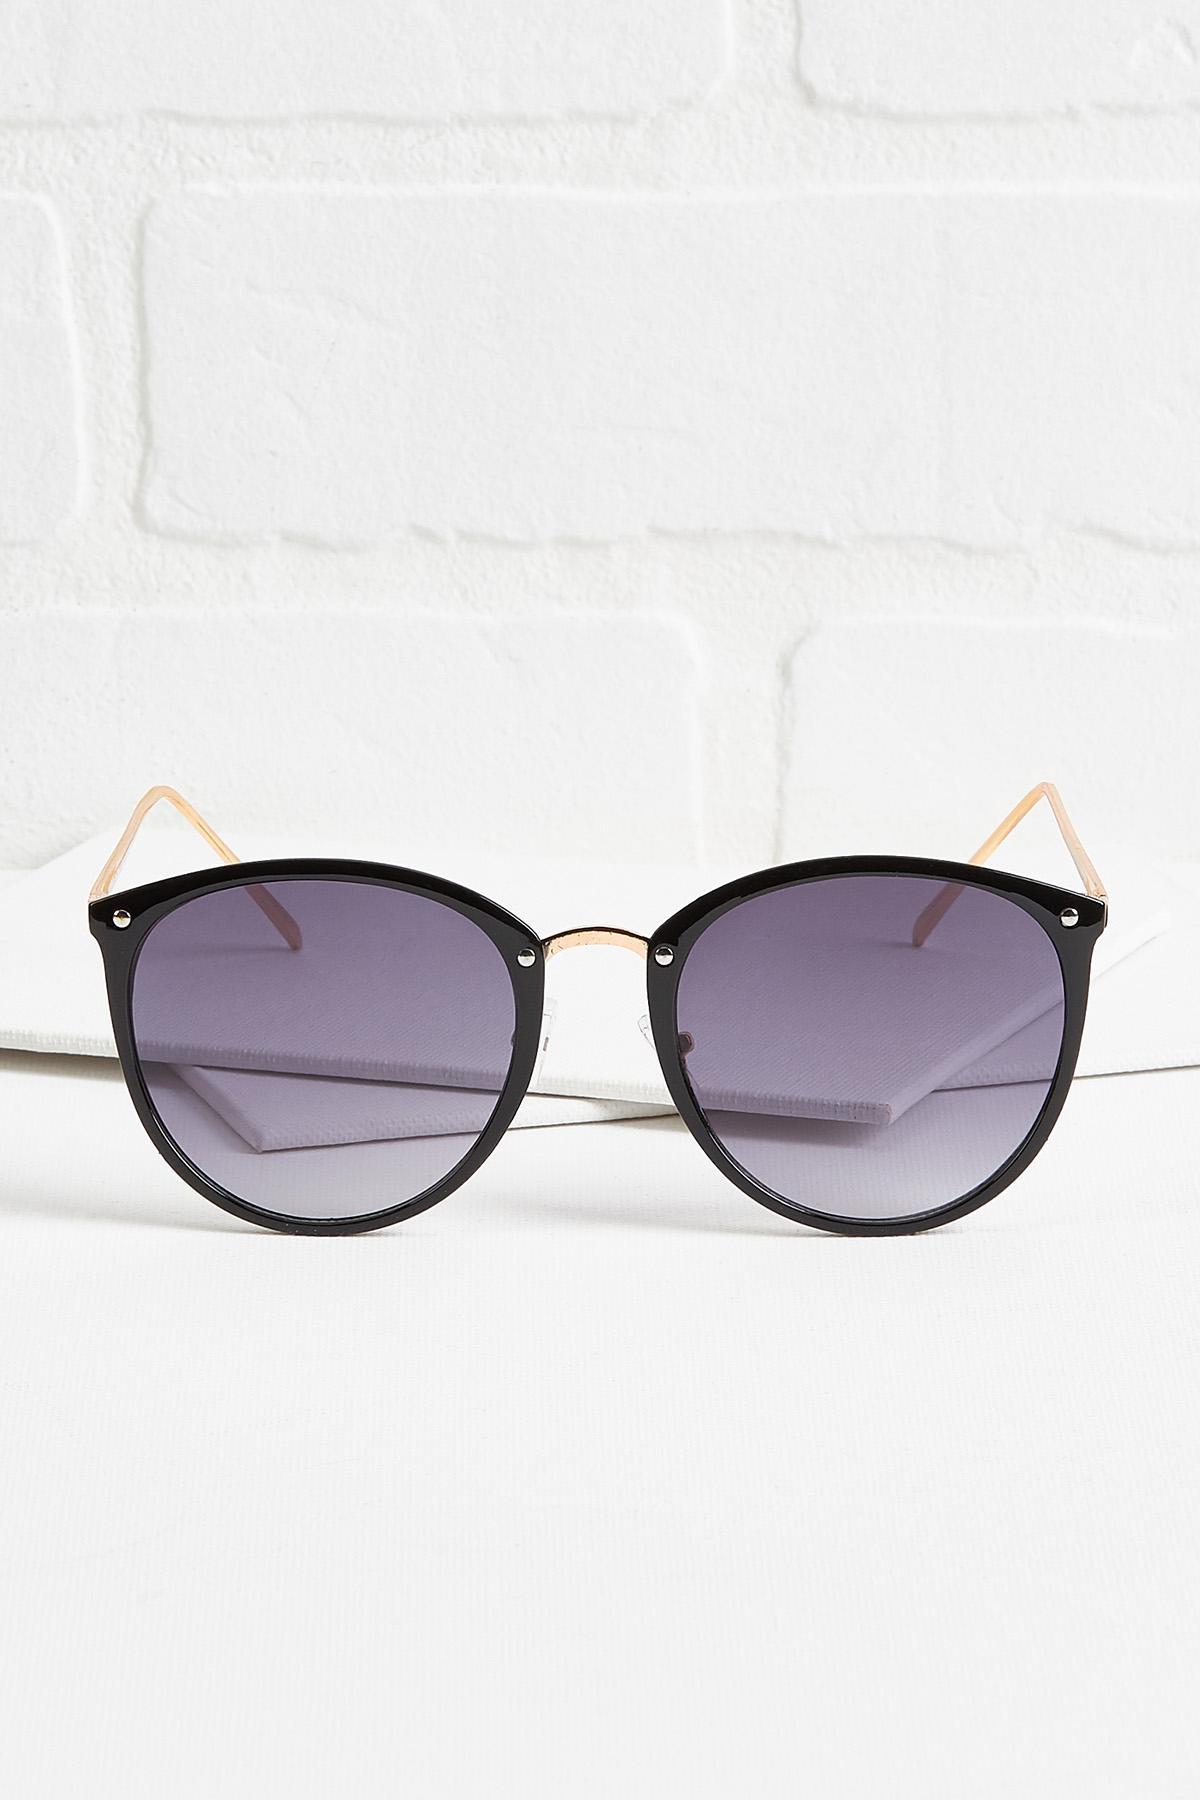 Gold Arm Sunglasses